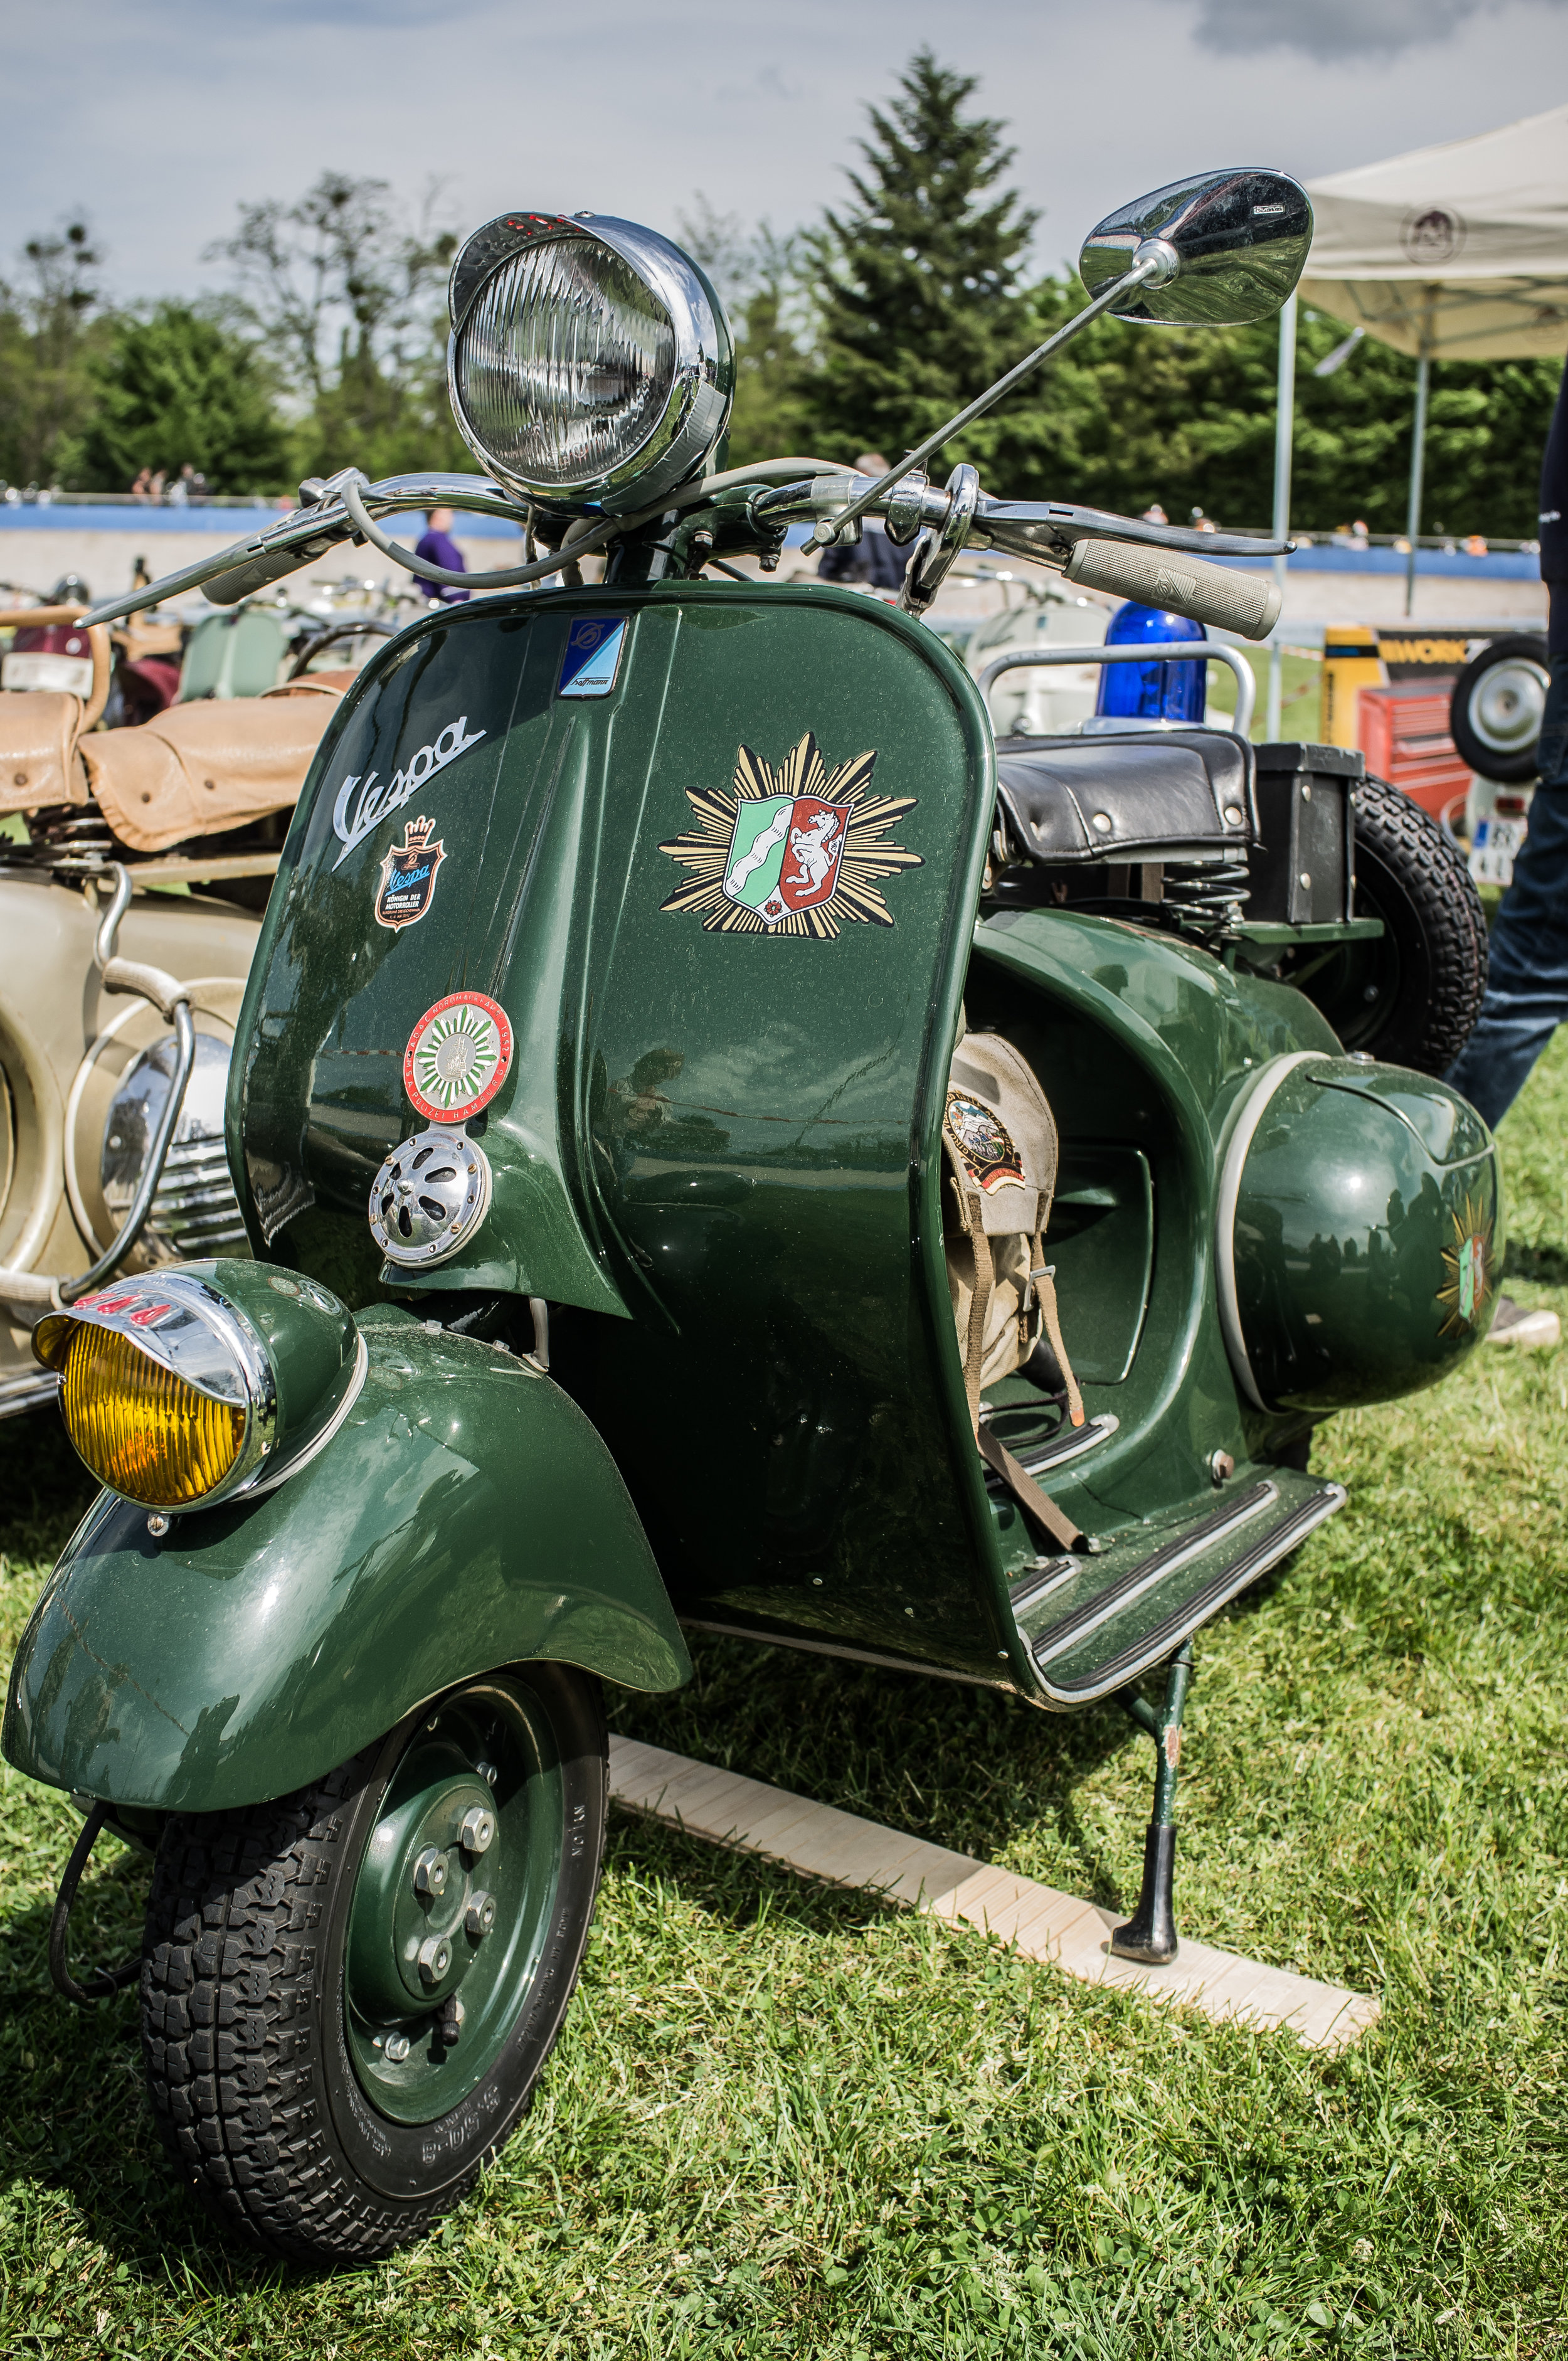 Photo by Ernie Troelf - restored German Police HC model